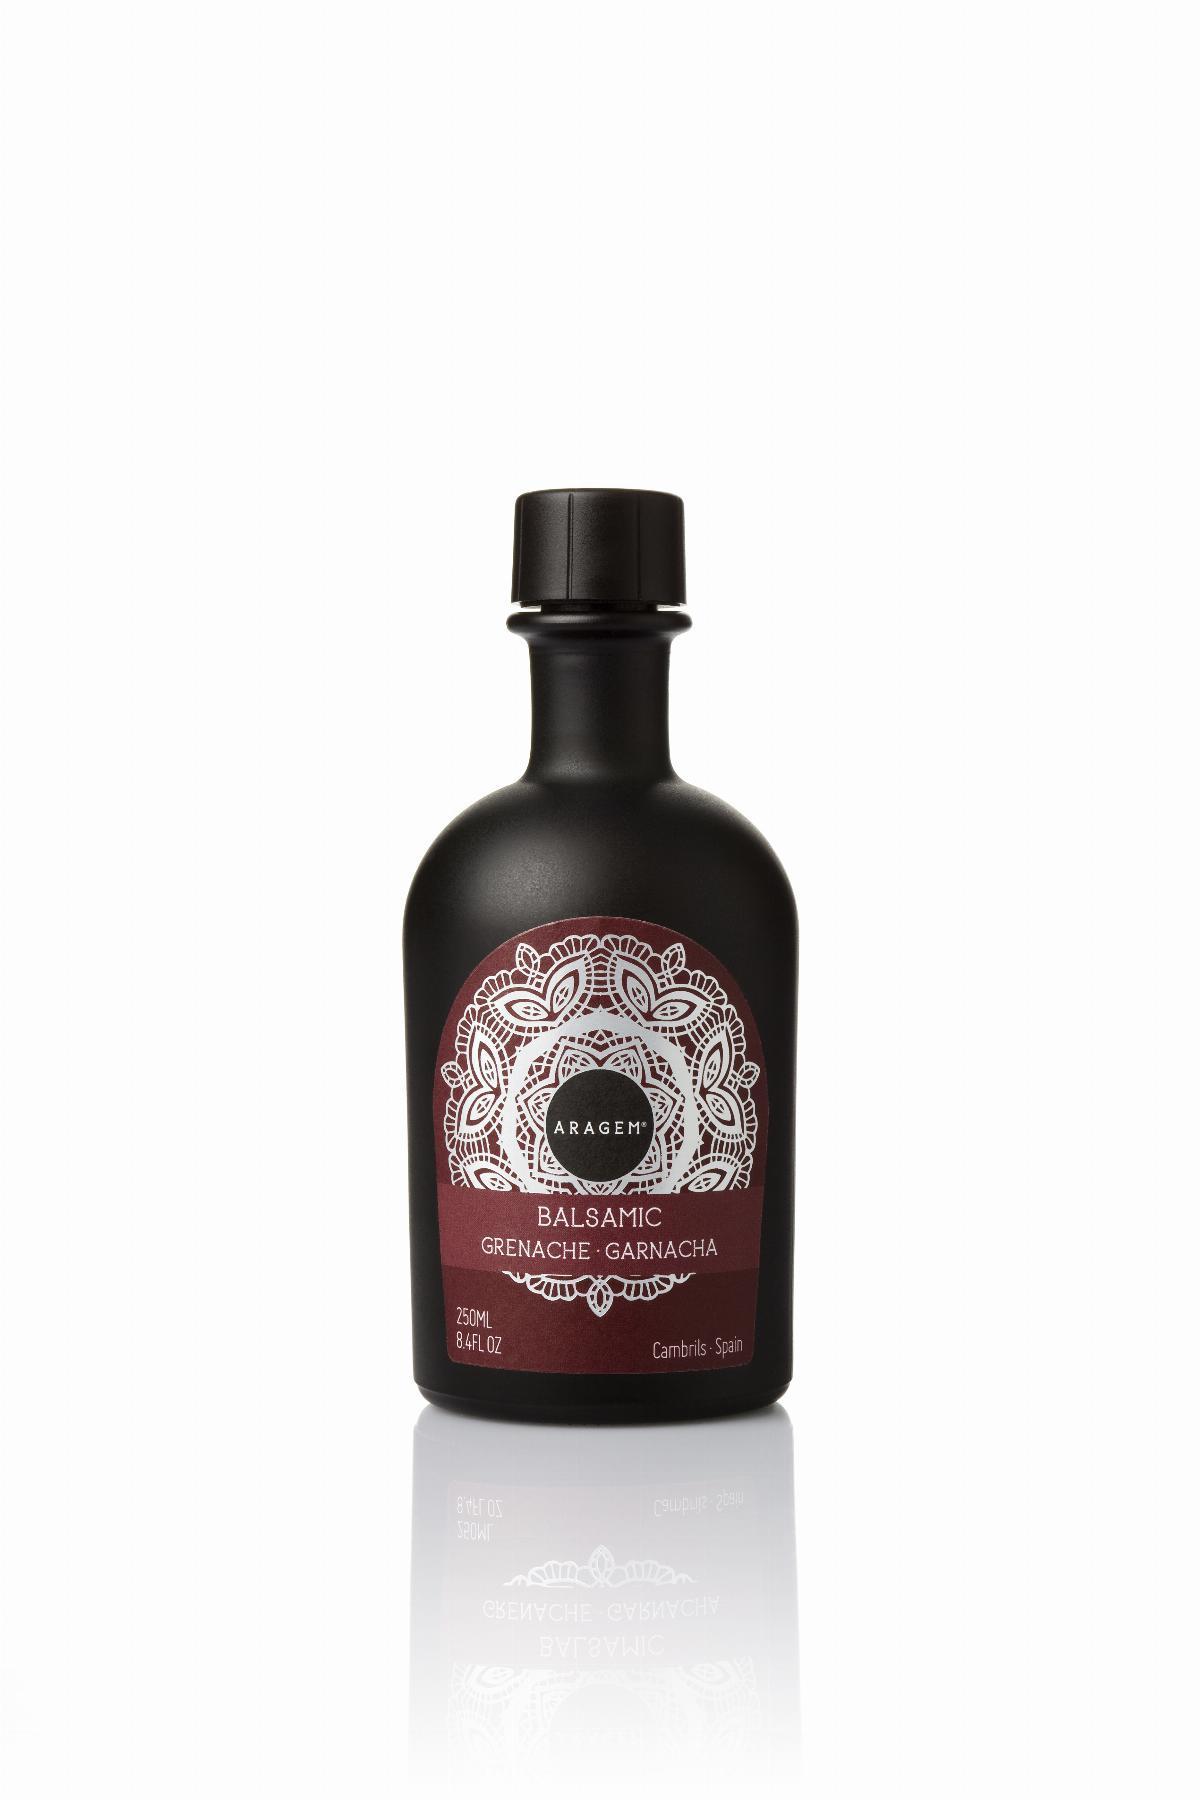 Vinaigre - Vinagre Balsàmic Garnatxa Aragem, ampolla negra 250ml. ES-EN - Mestral Cambrils